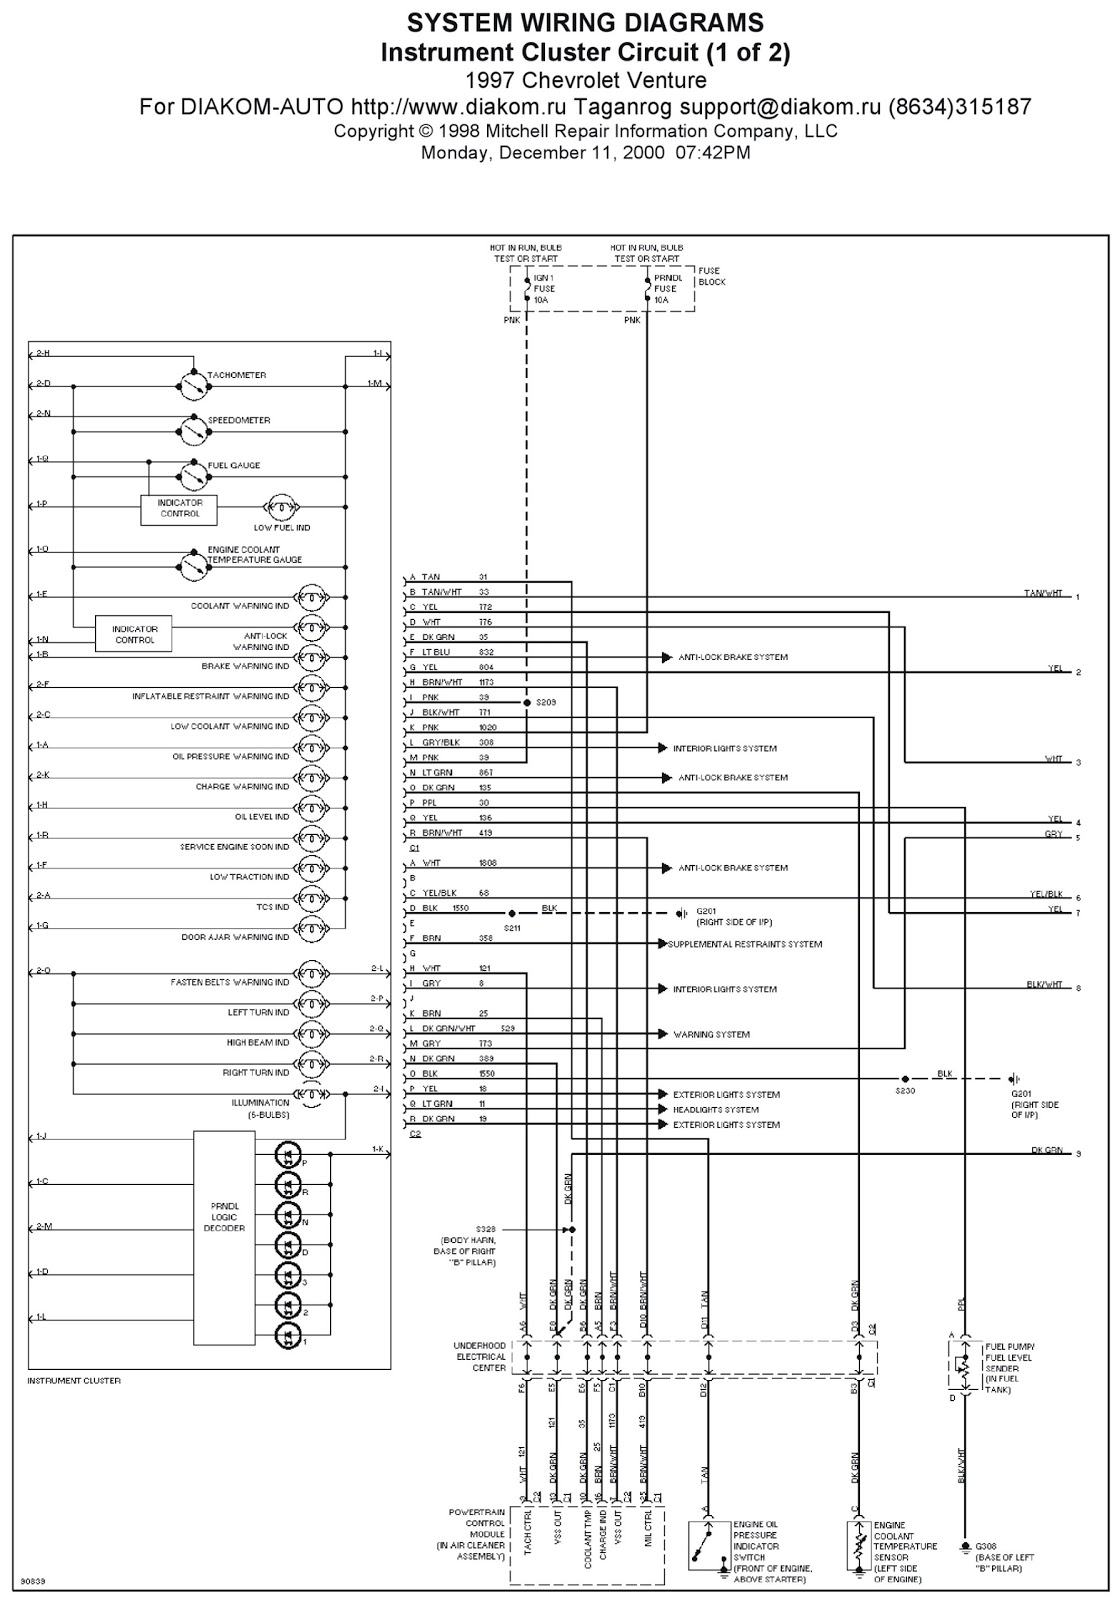 1997 Chevrolet Venture Instrument Cluster Circuit System